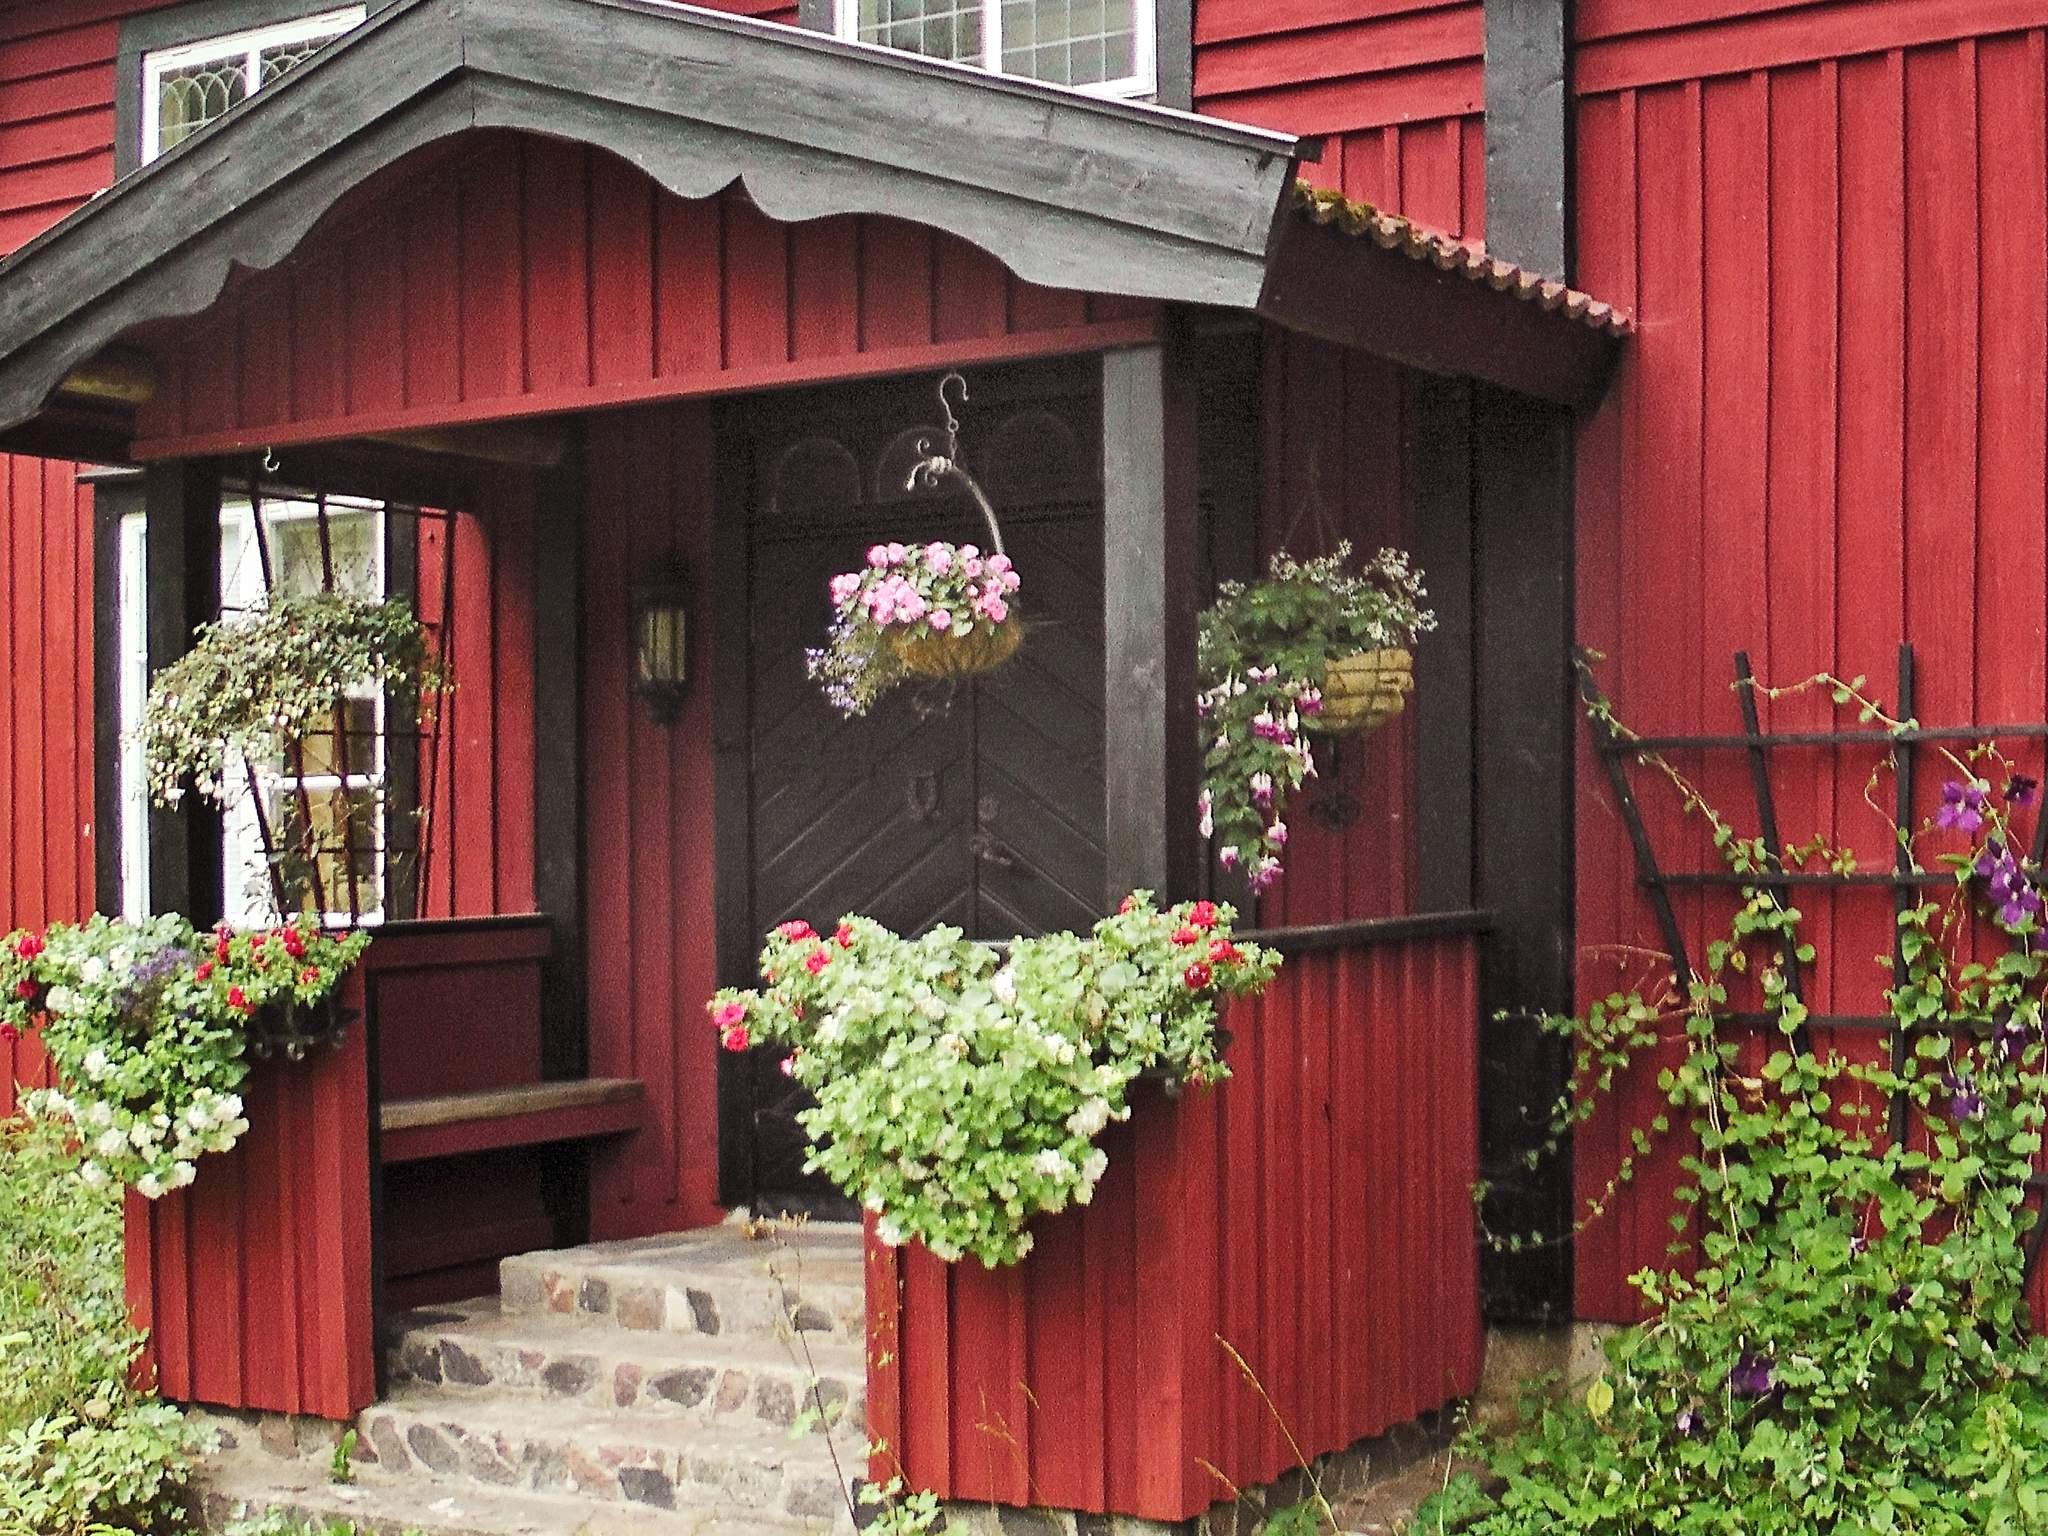 Ferienhaus Väddö (85466), Väddö, Region Stockholm, Mittelschweden, Schweden, Bild 14